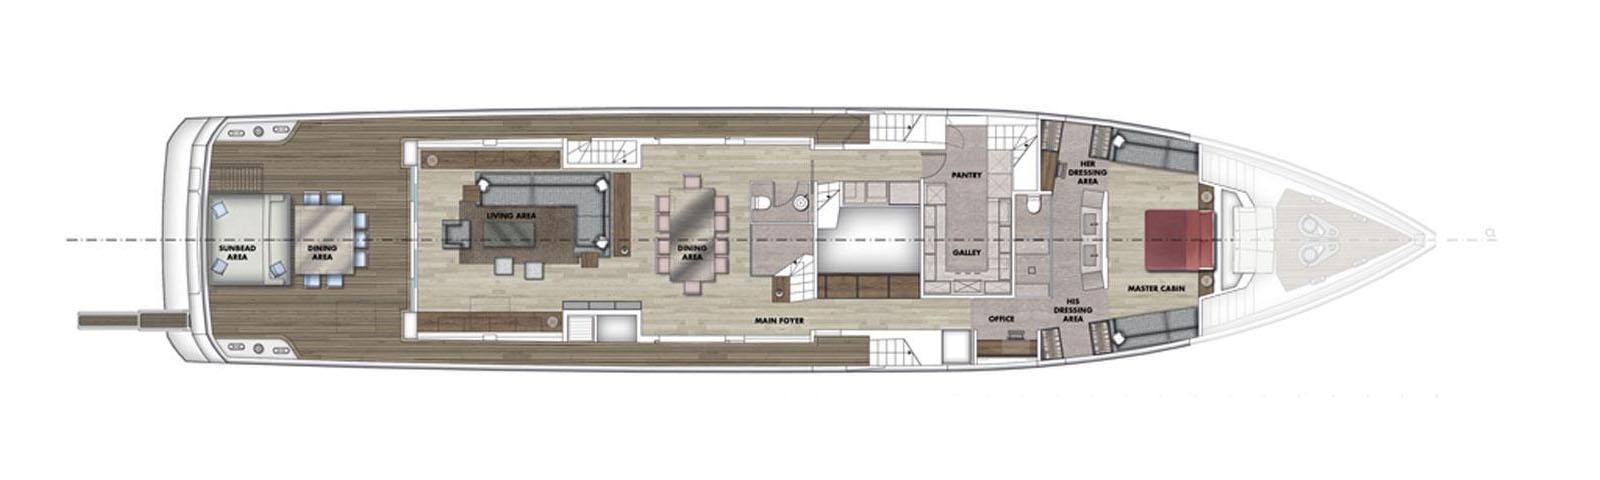 jedi-deck-plan-main-deck-h.jpg